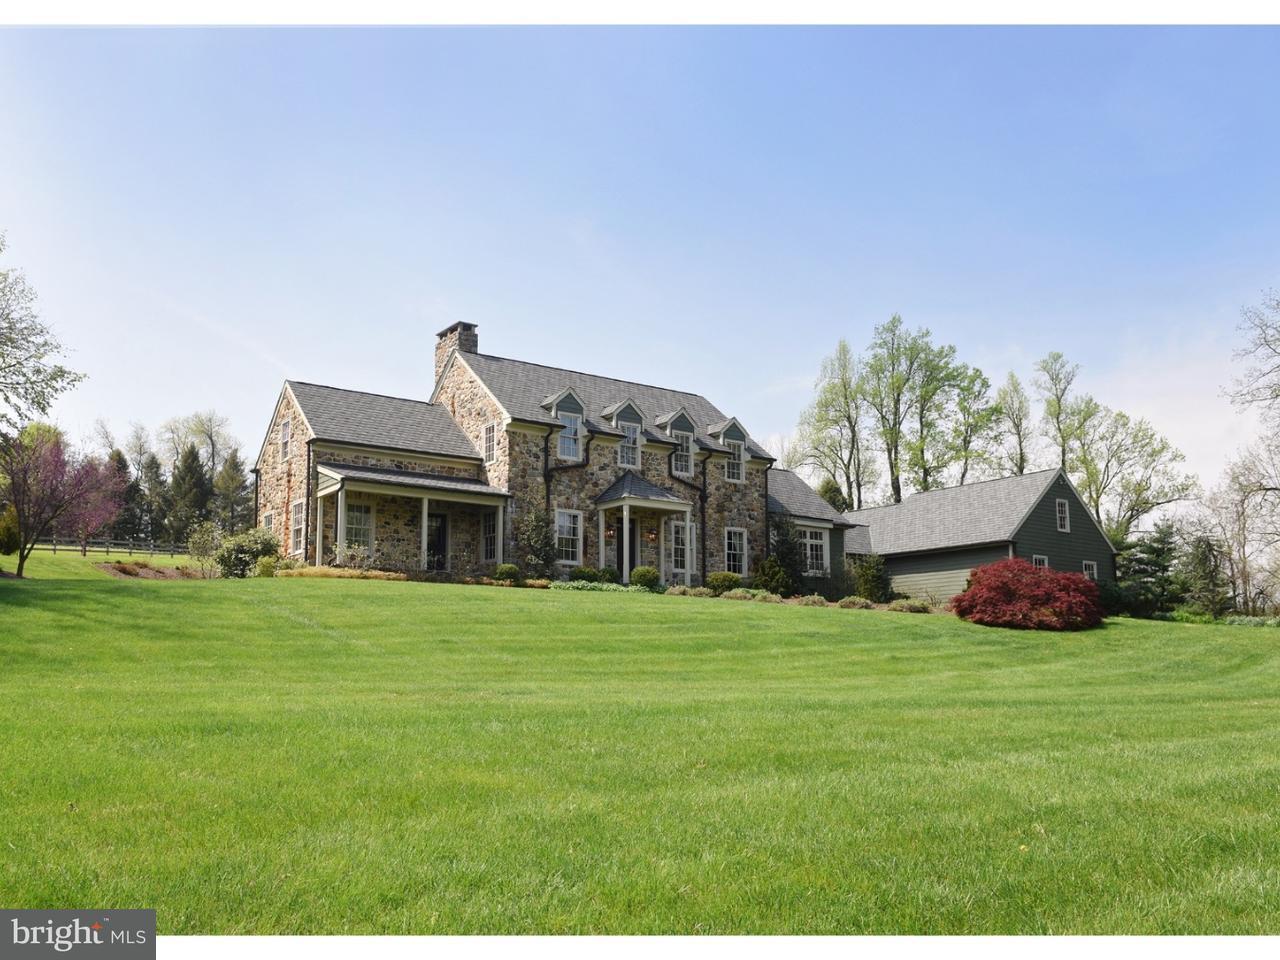 Single Family Home for Sale at 3130 HORSESHOE Trail Glenmoore, Pennsylvania 19343 United States